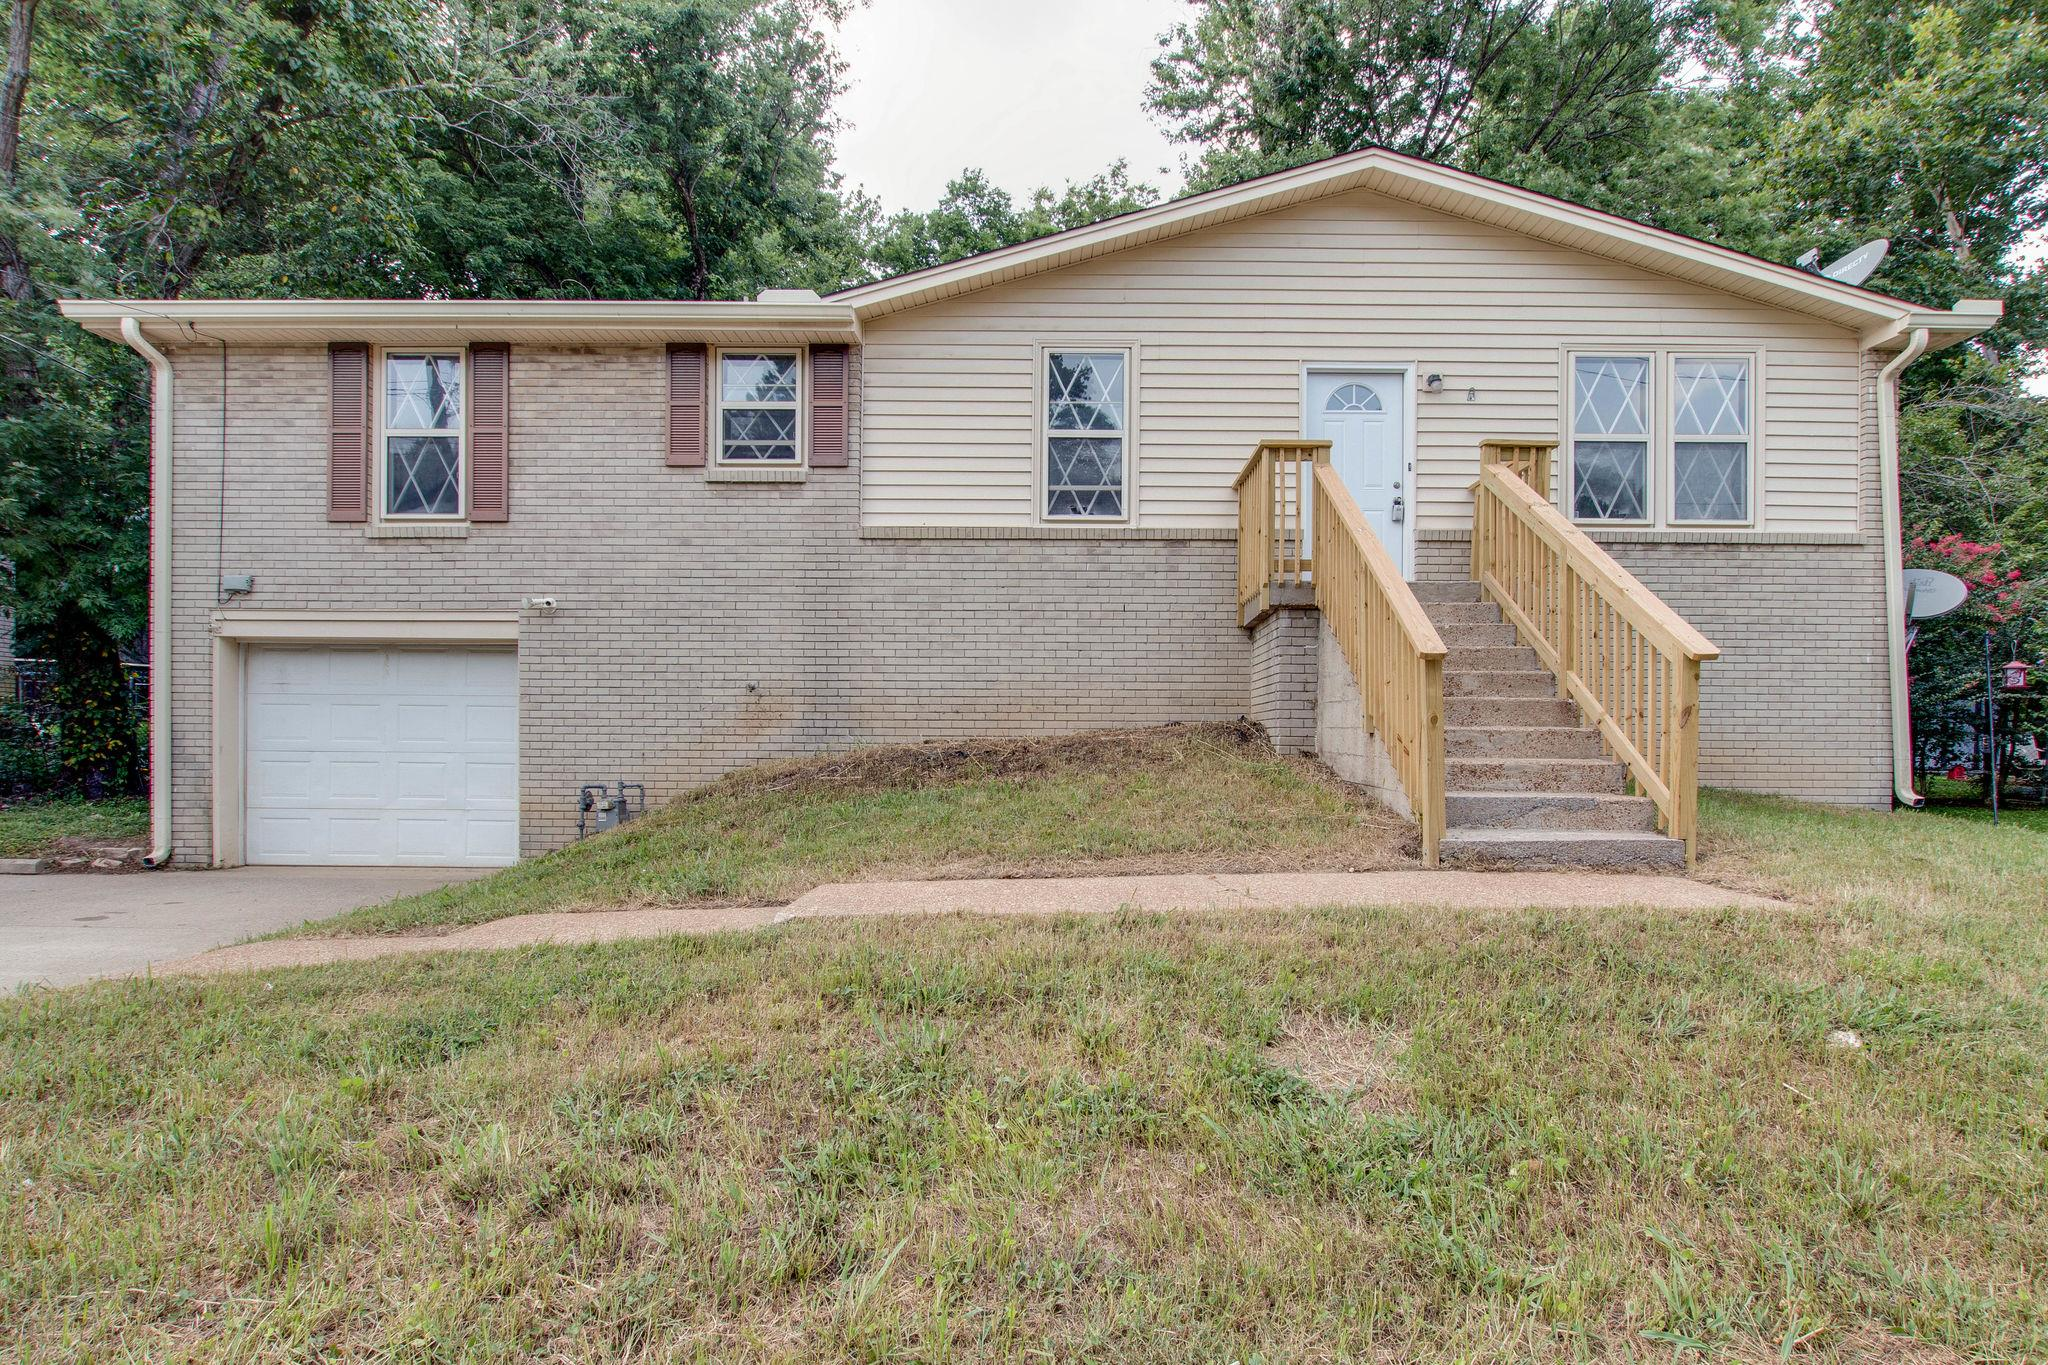 One of Nashville-Antioch 4 Bedroom Homes for Sale at 4921 Cimarron Way